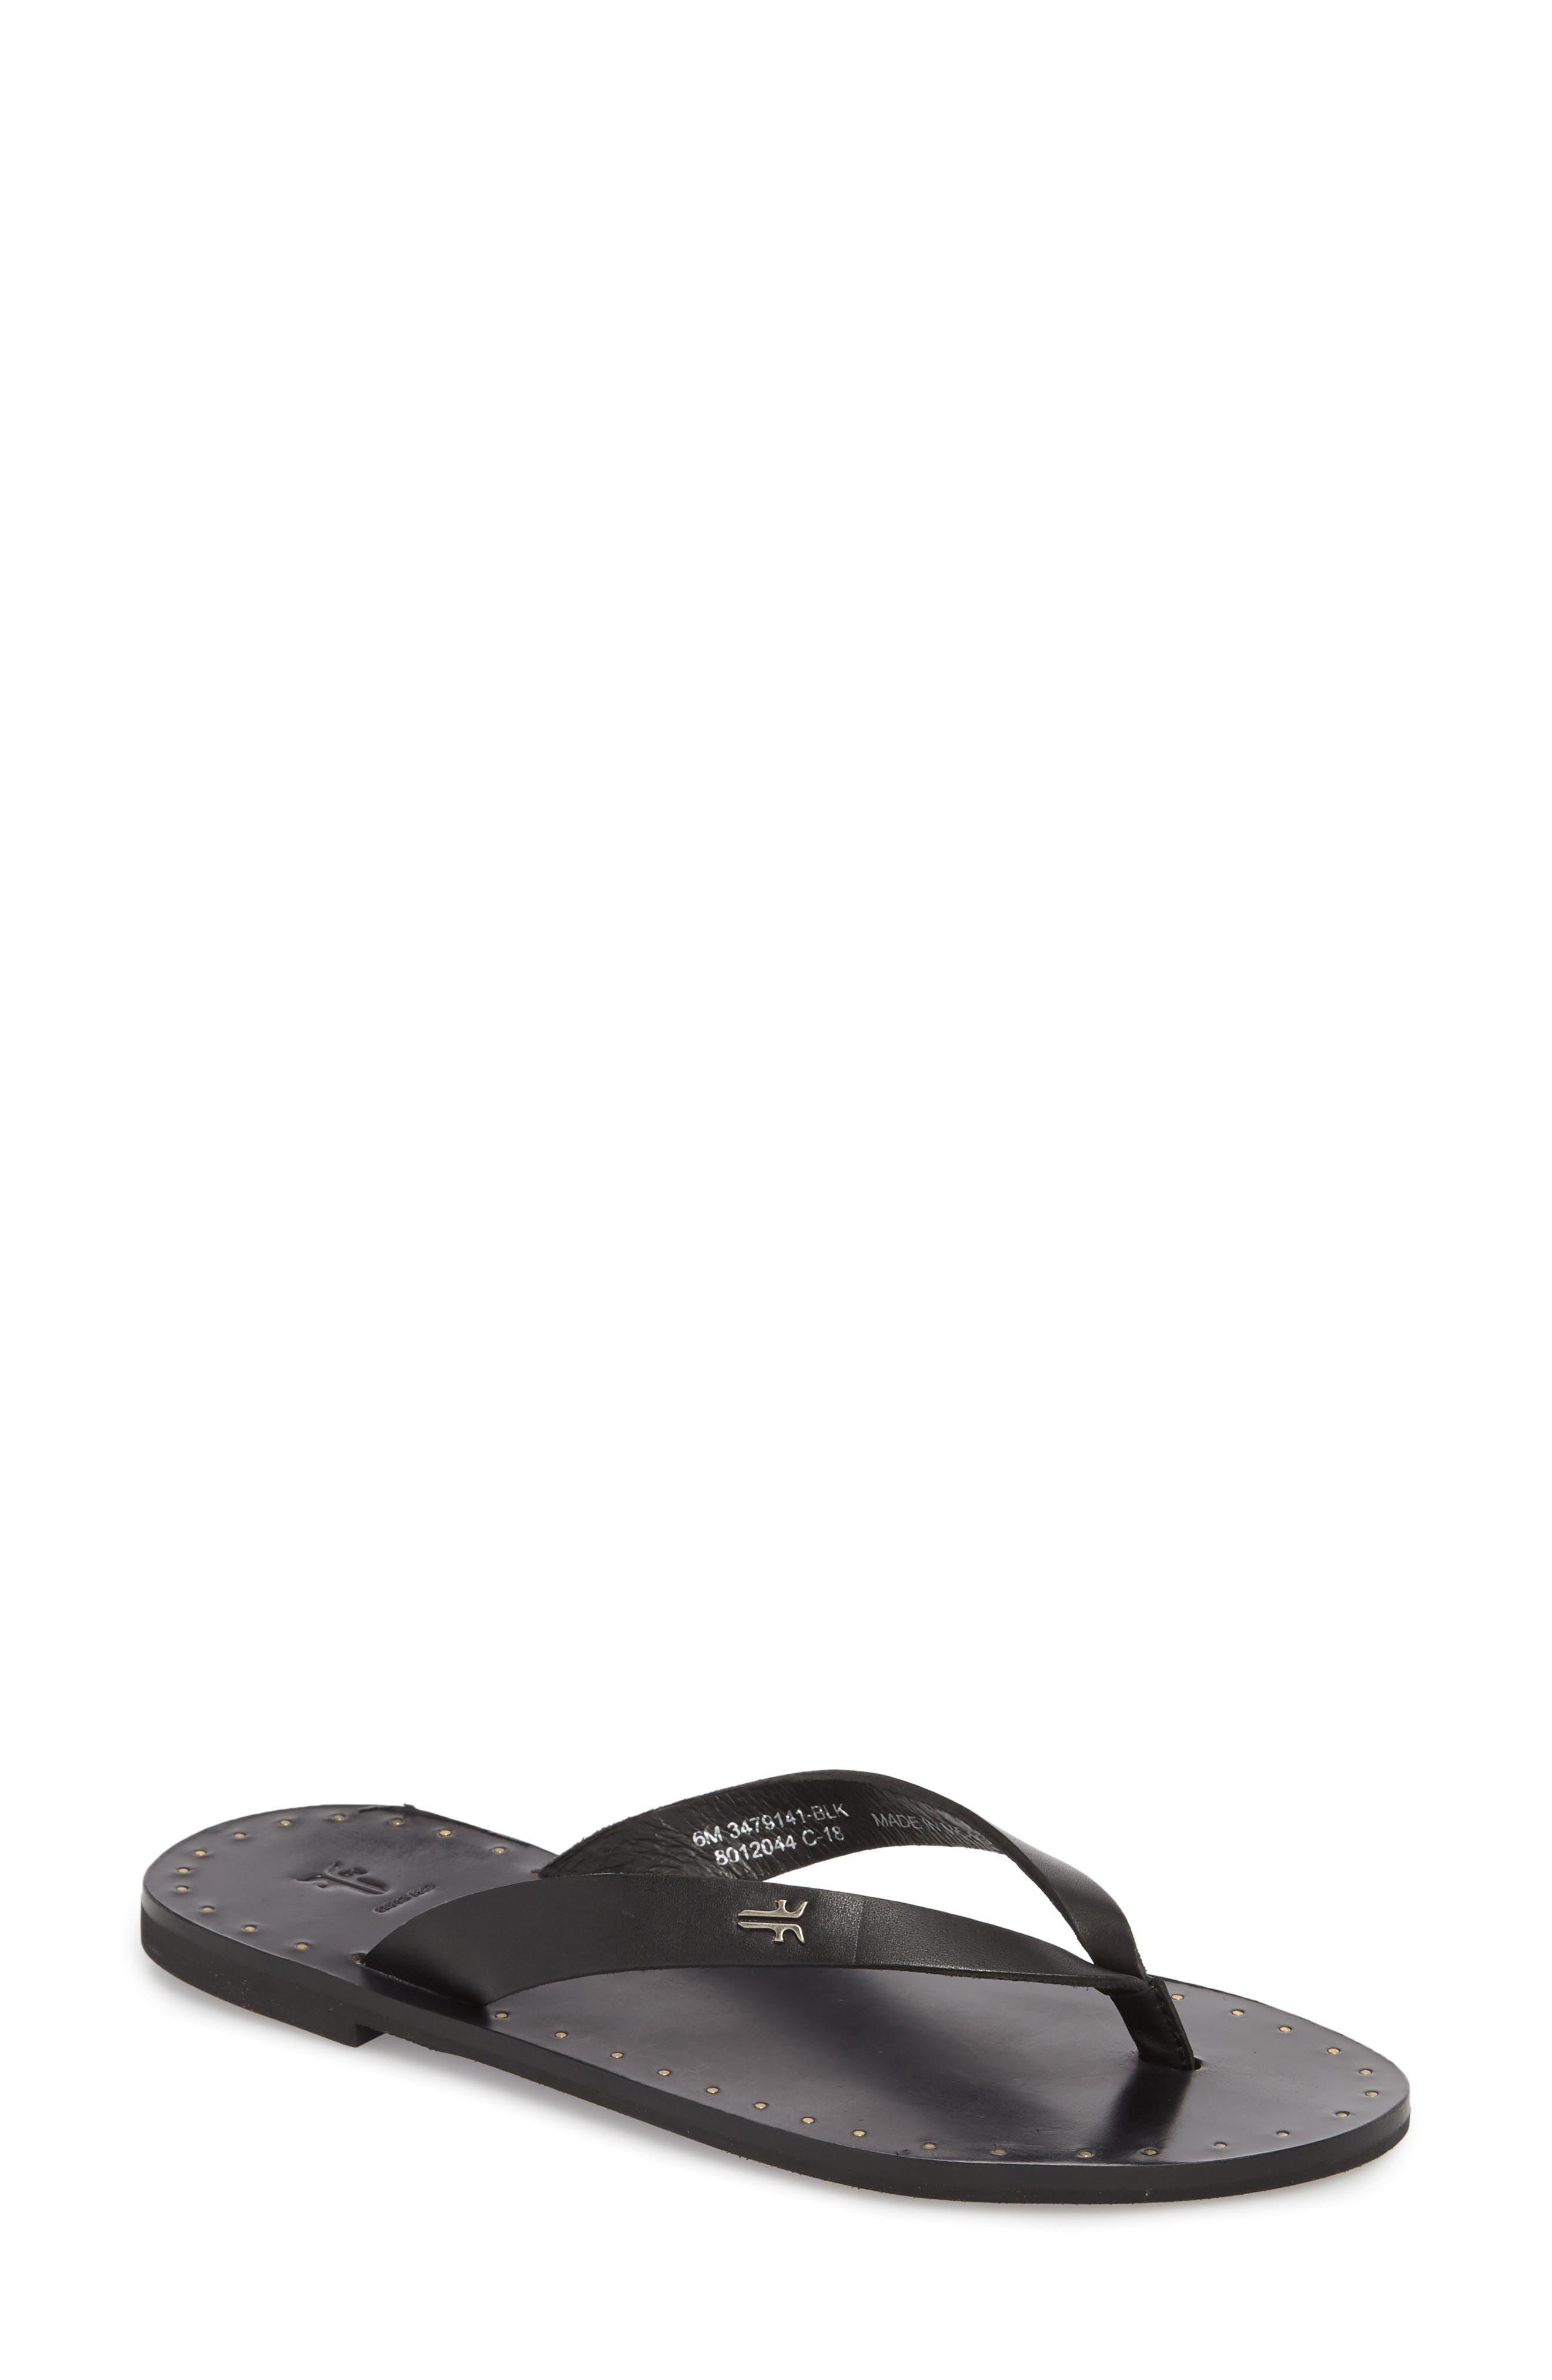 Ally Flip Flop,                         Main,                         color, Black Leather